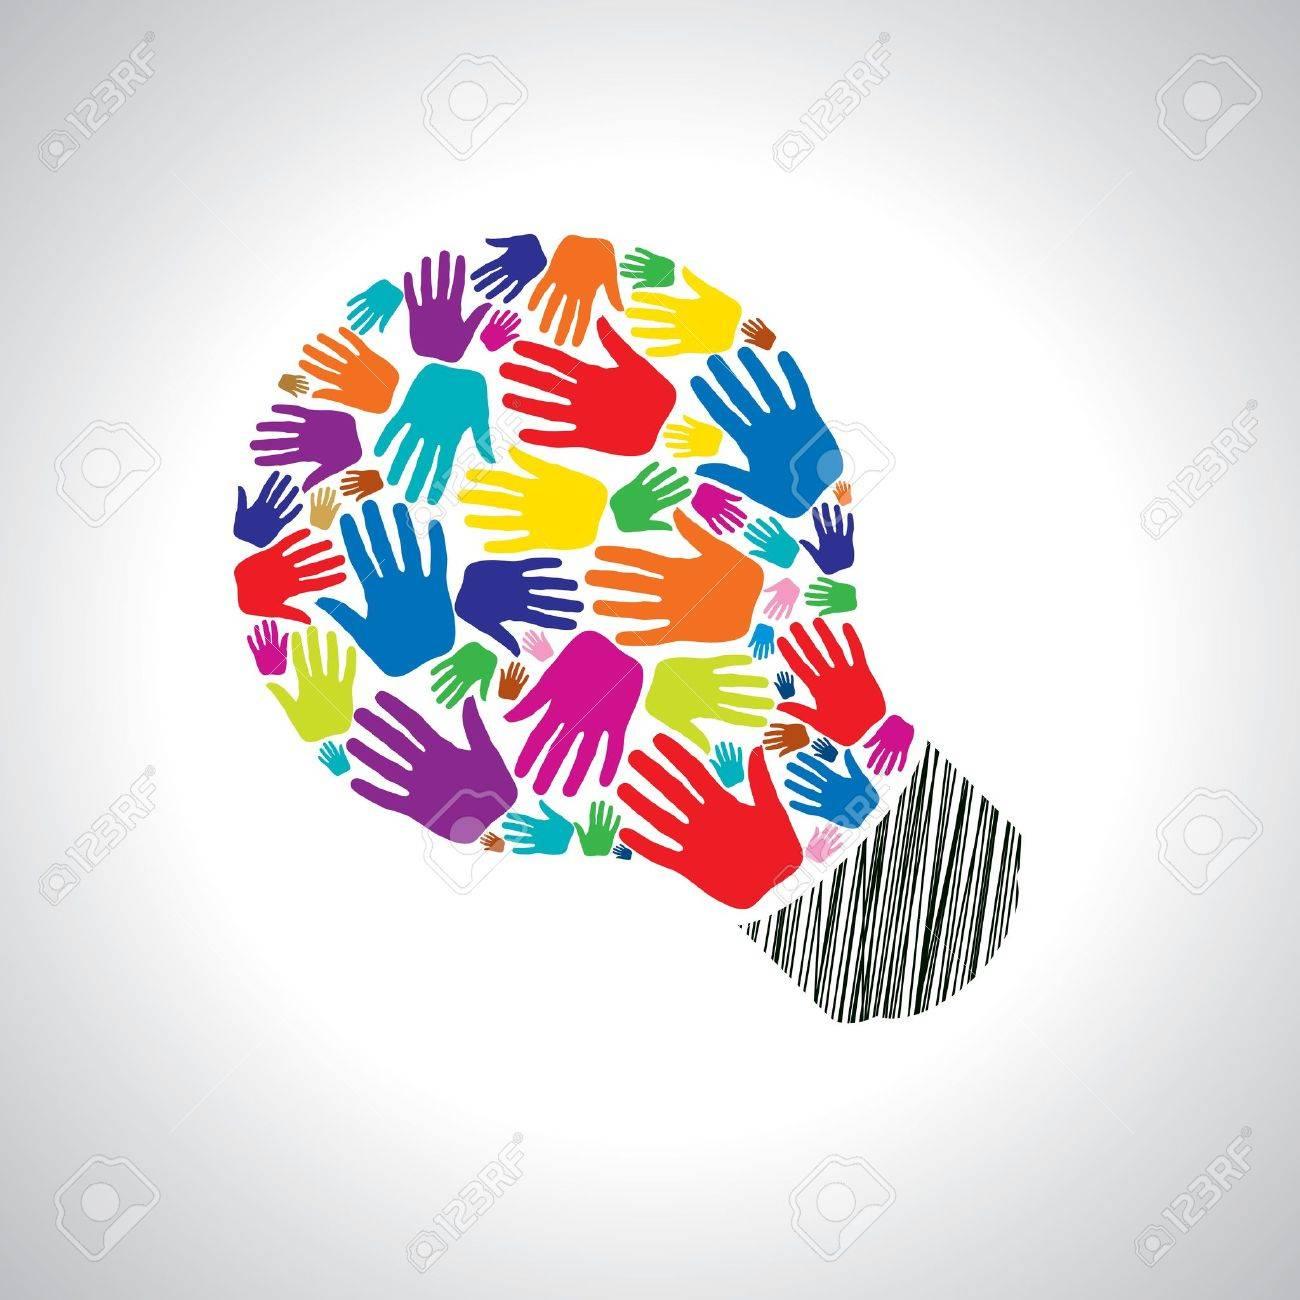 teamwork idea - 17725203